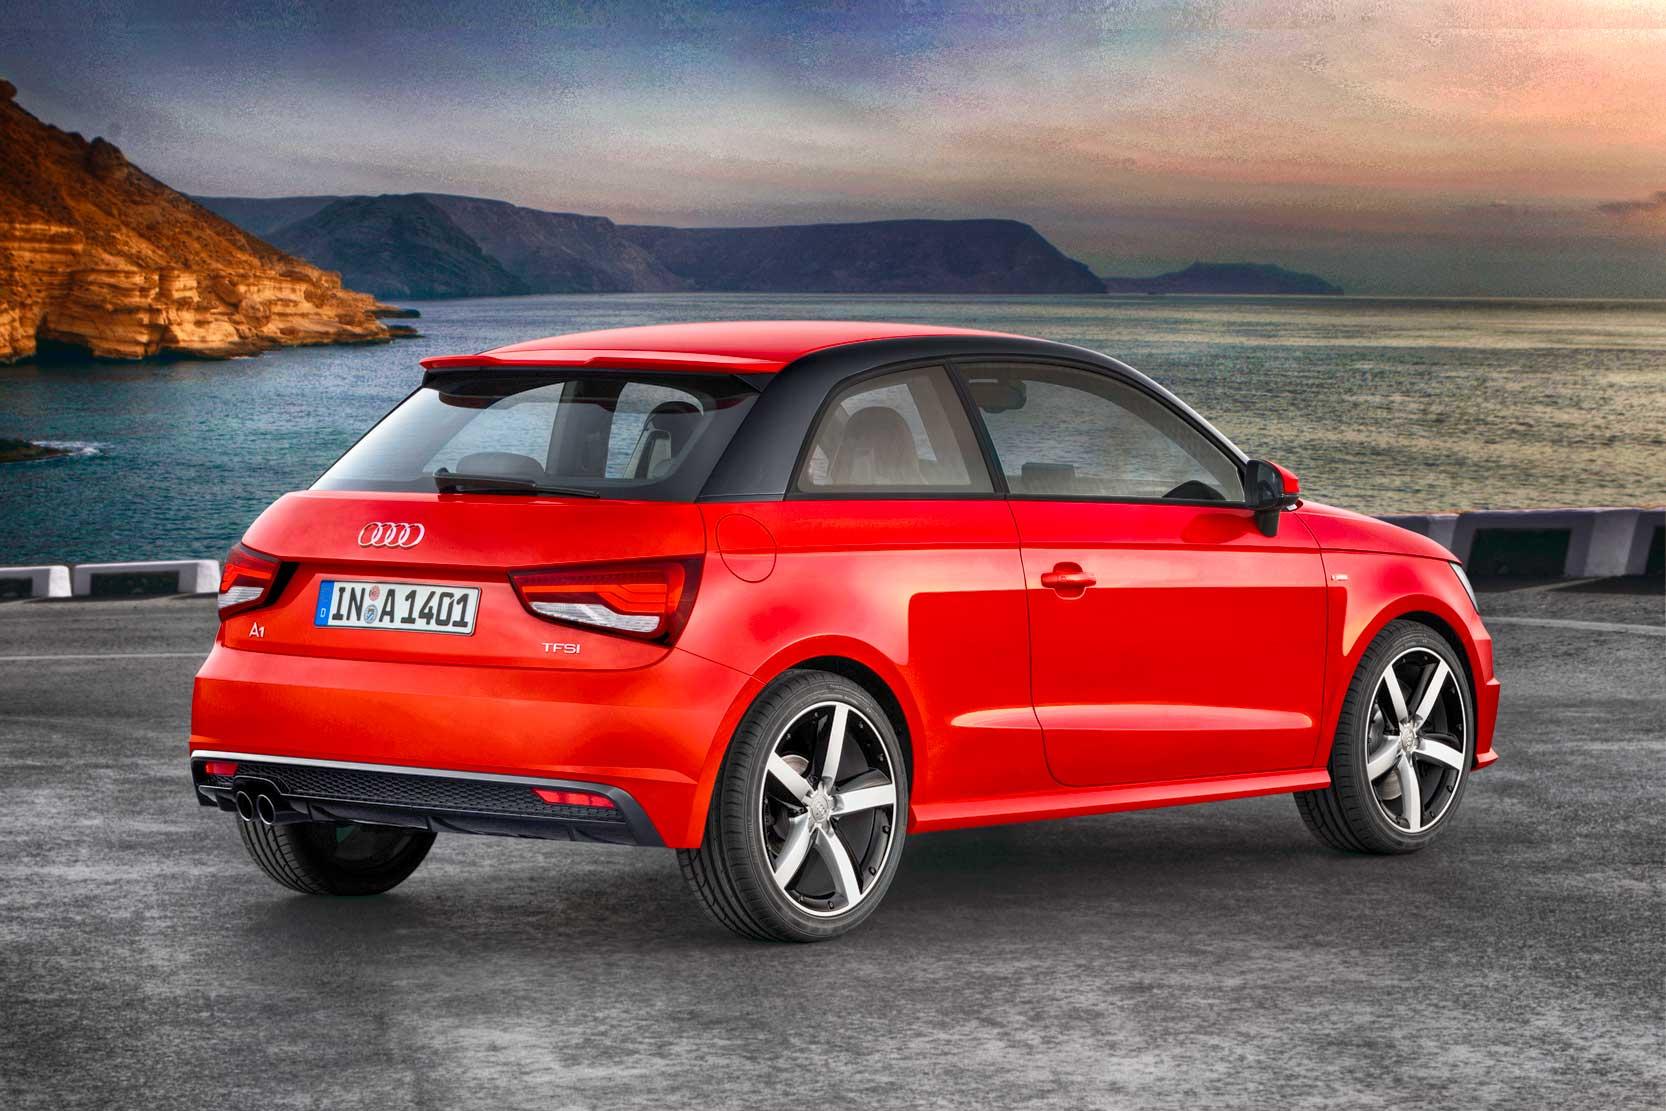 Audi A1 Fiche Technique : fiche technique audi a1 1 6 tdi 116 ultra 2015 ~ Medecine-chirurgie-esthetiques.com Avis de Voitures